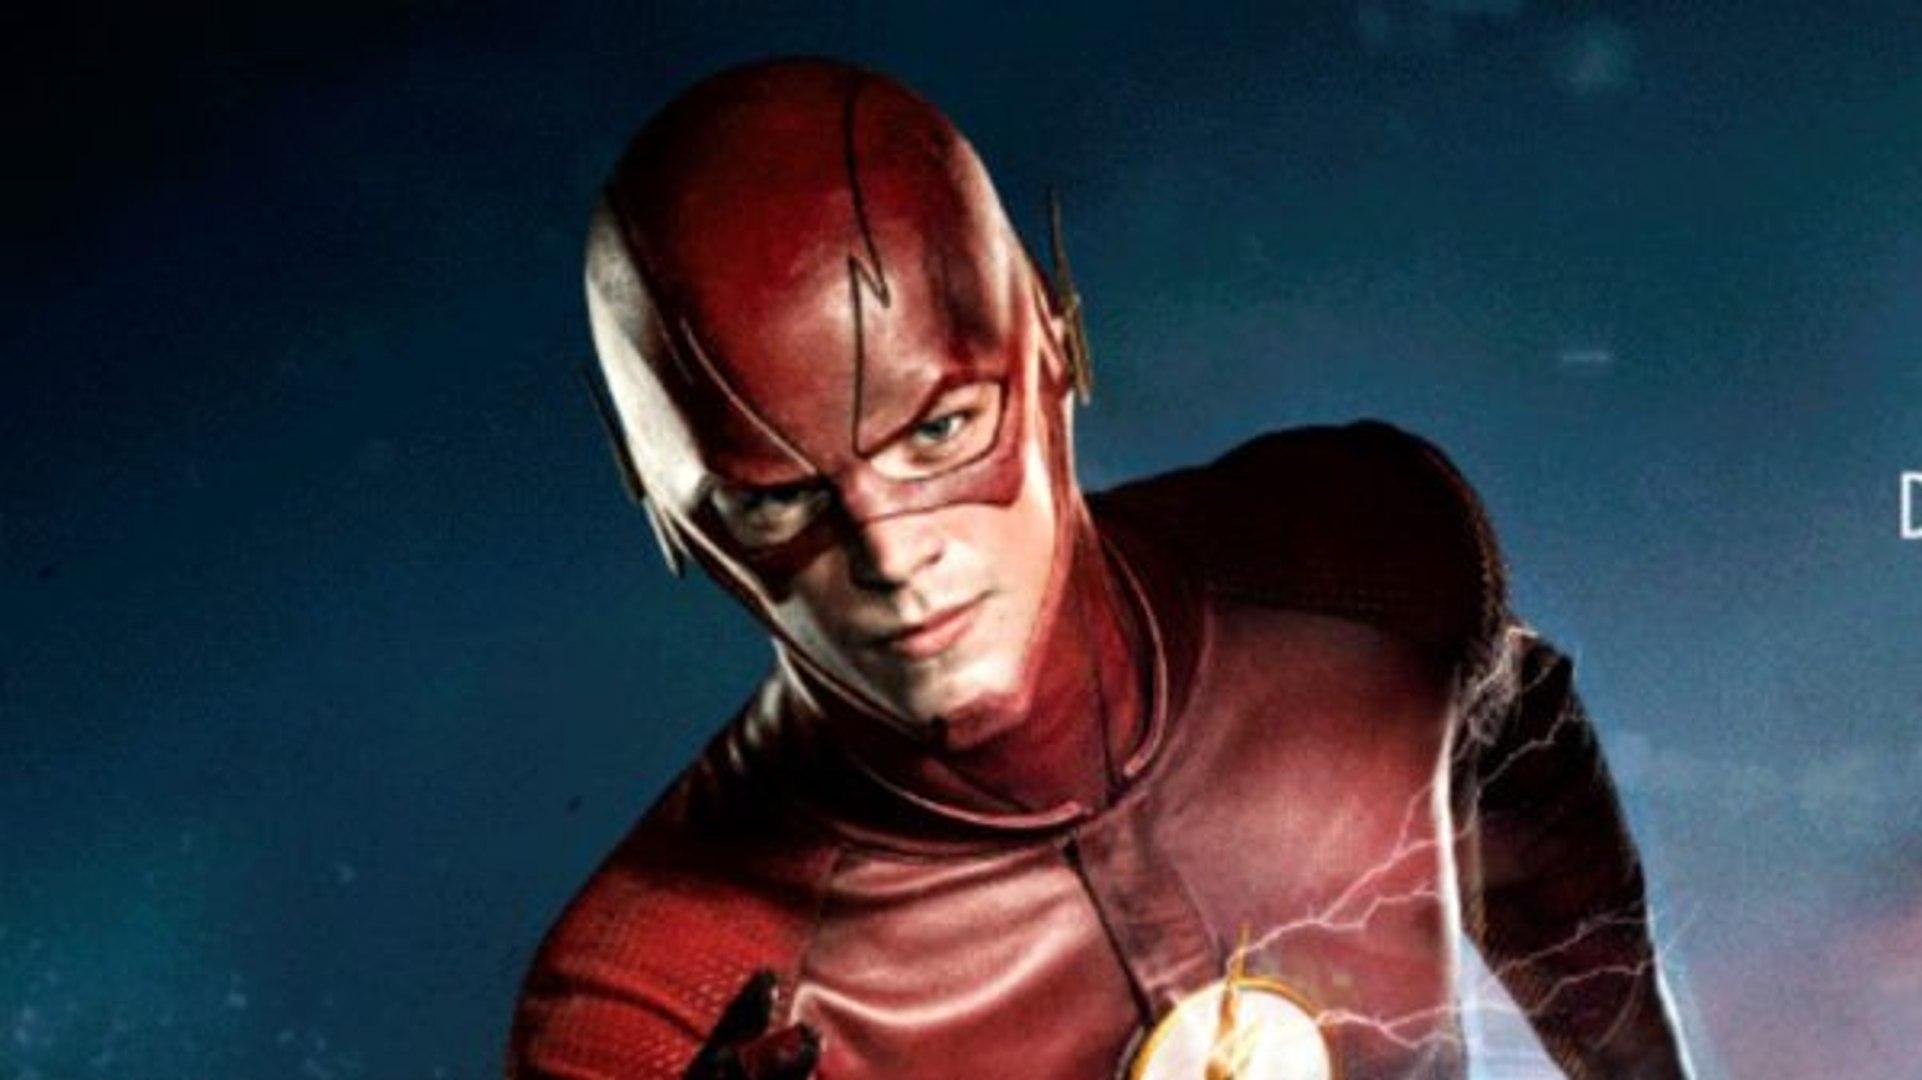 The Flash Season 4 - Episode 1